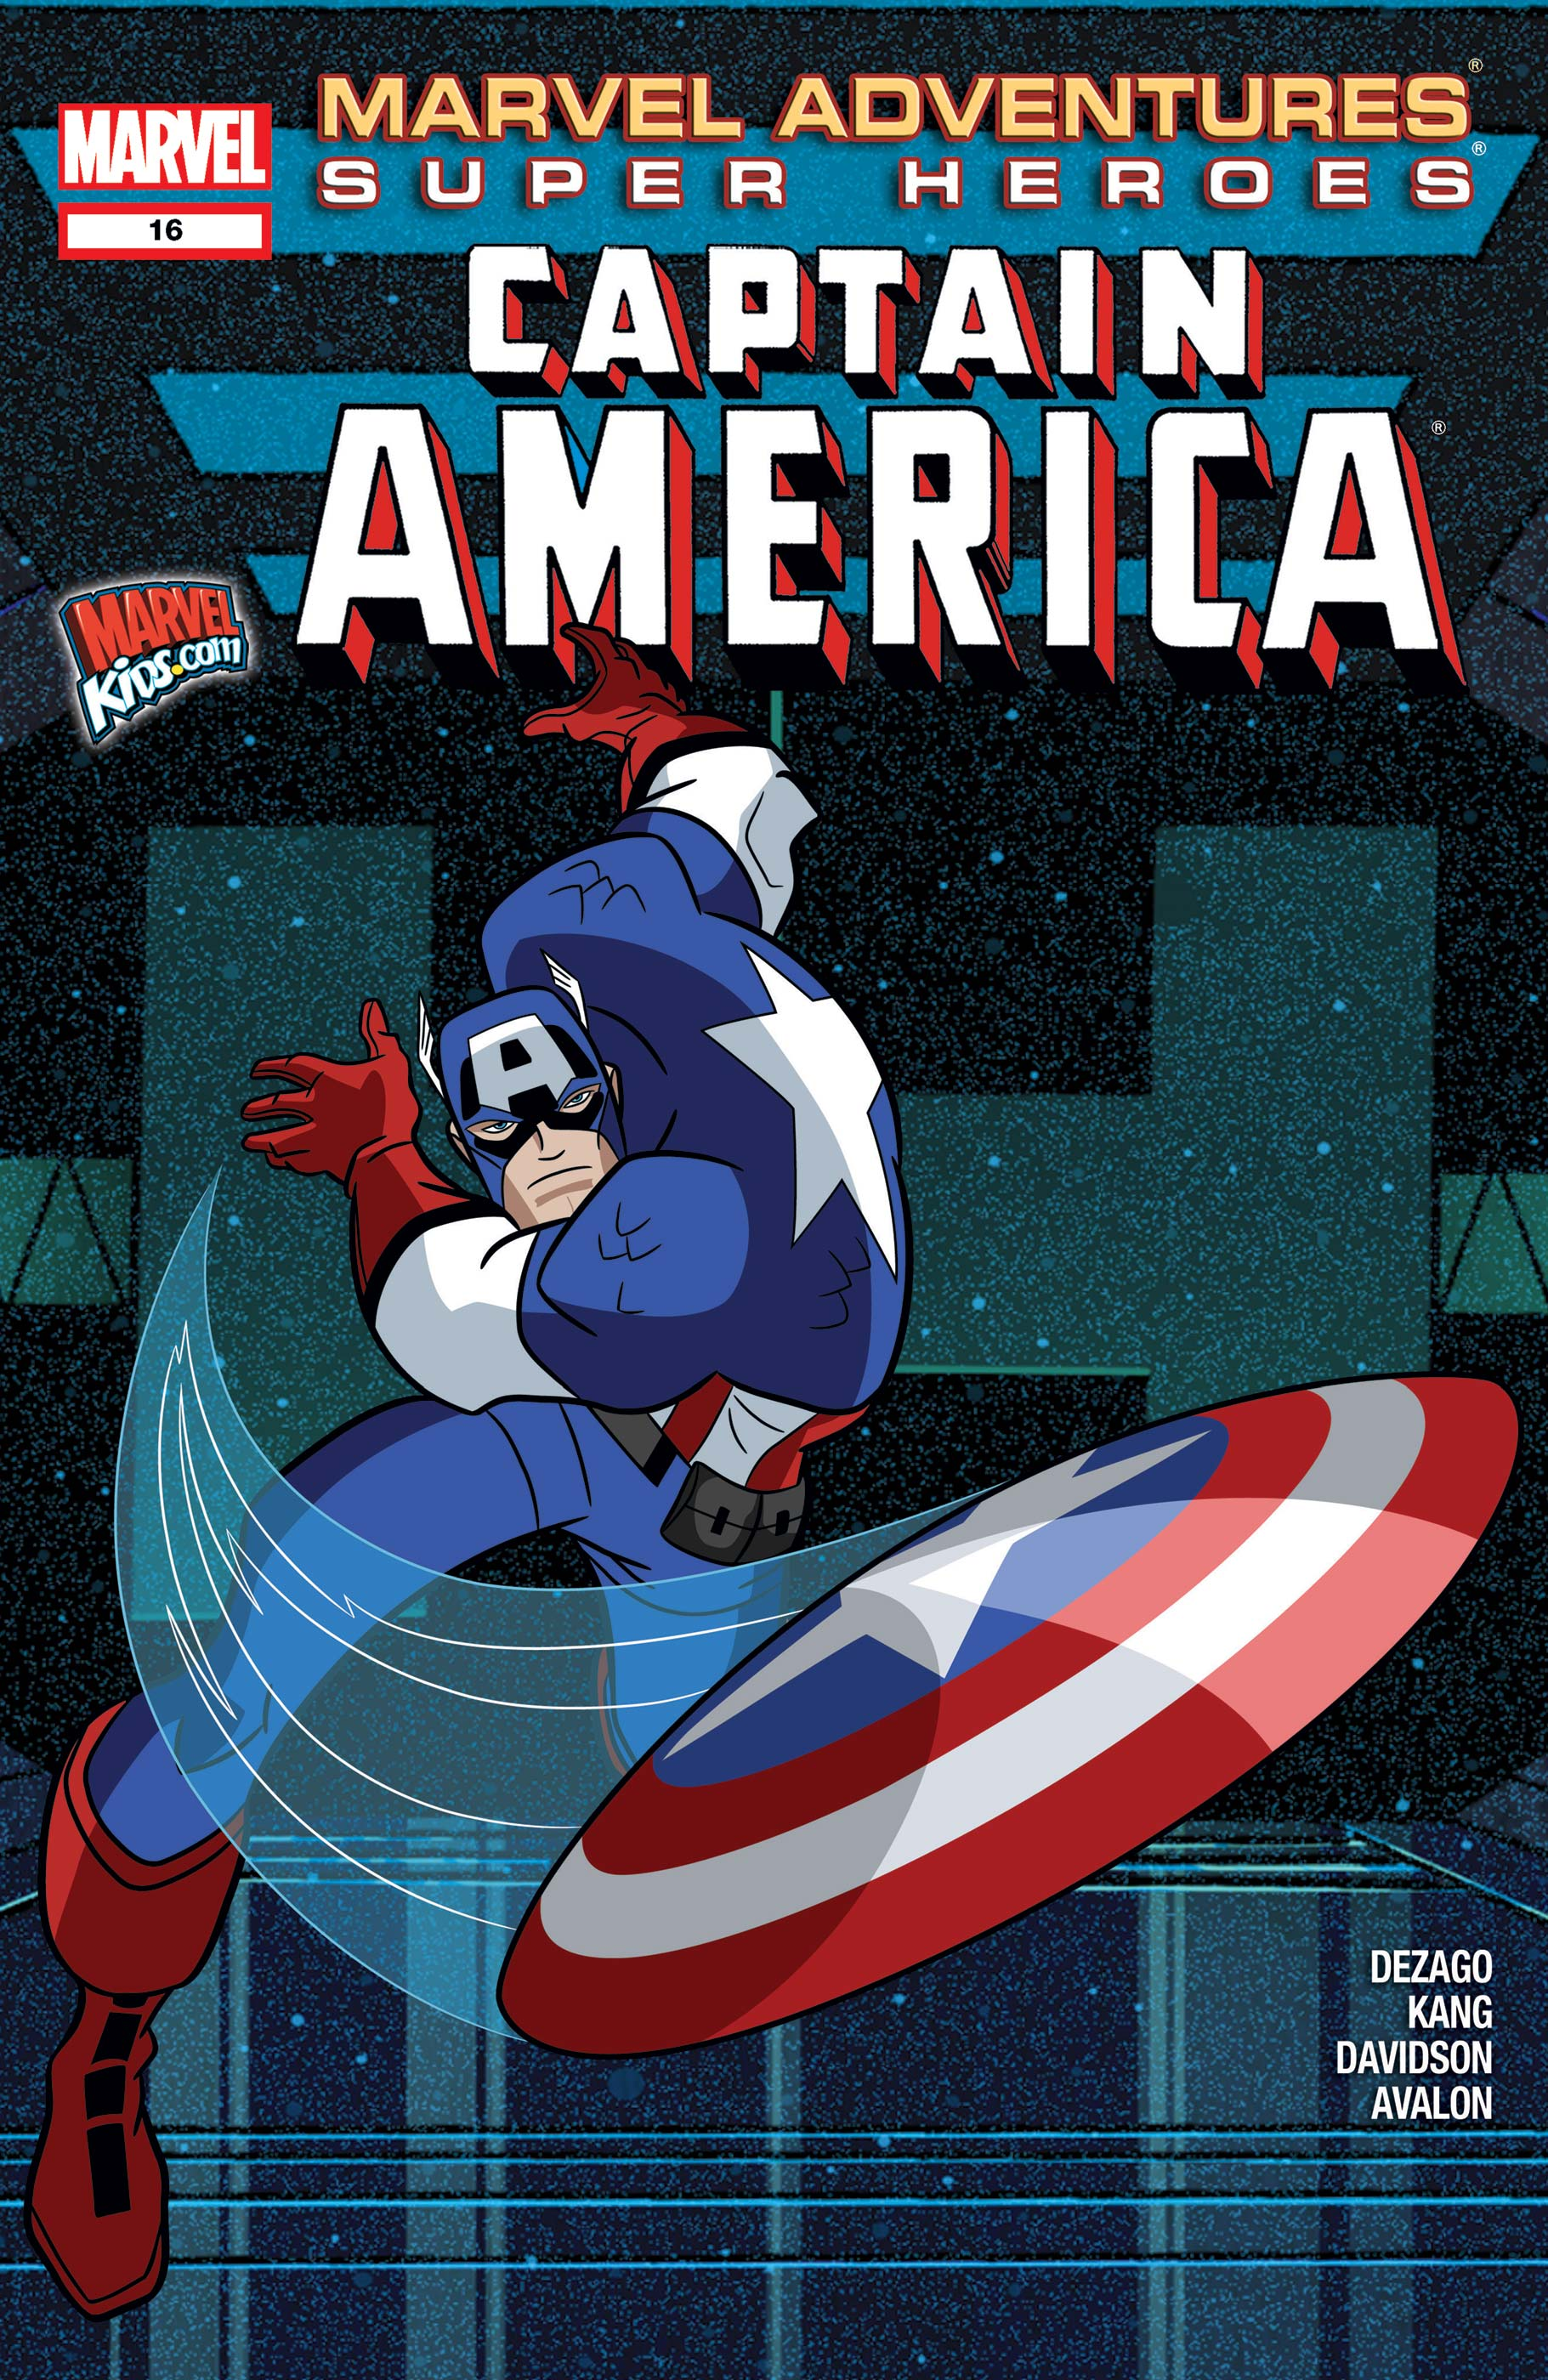 Marvel Adventures Super Heroes (2010) #16